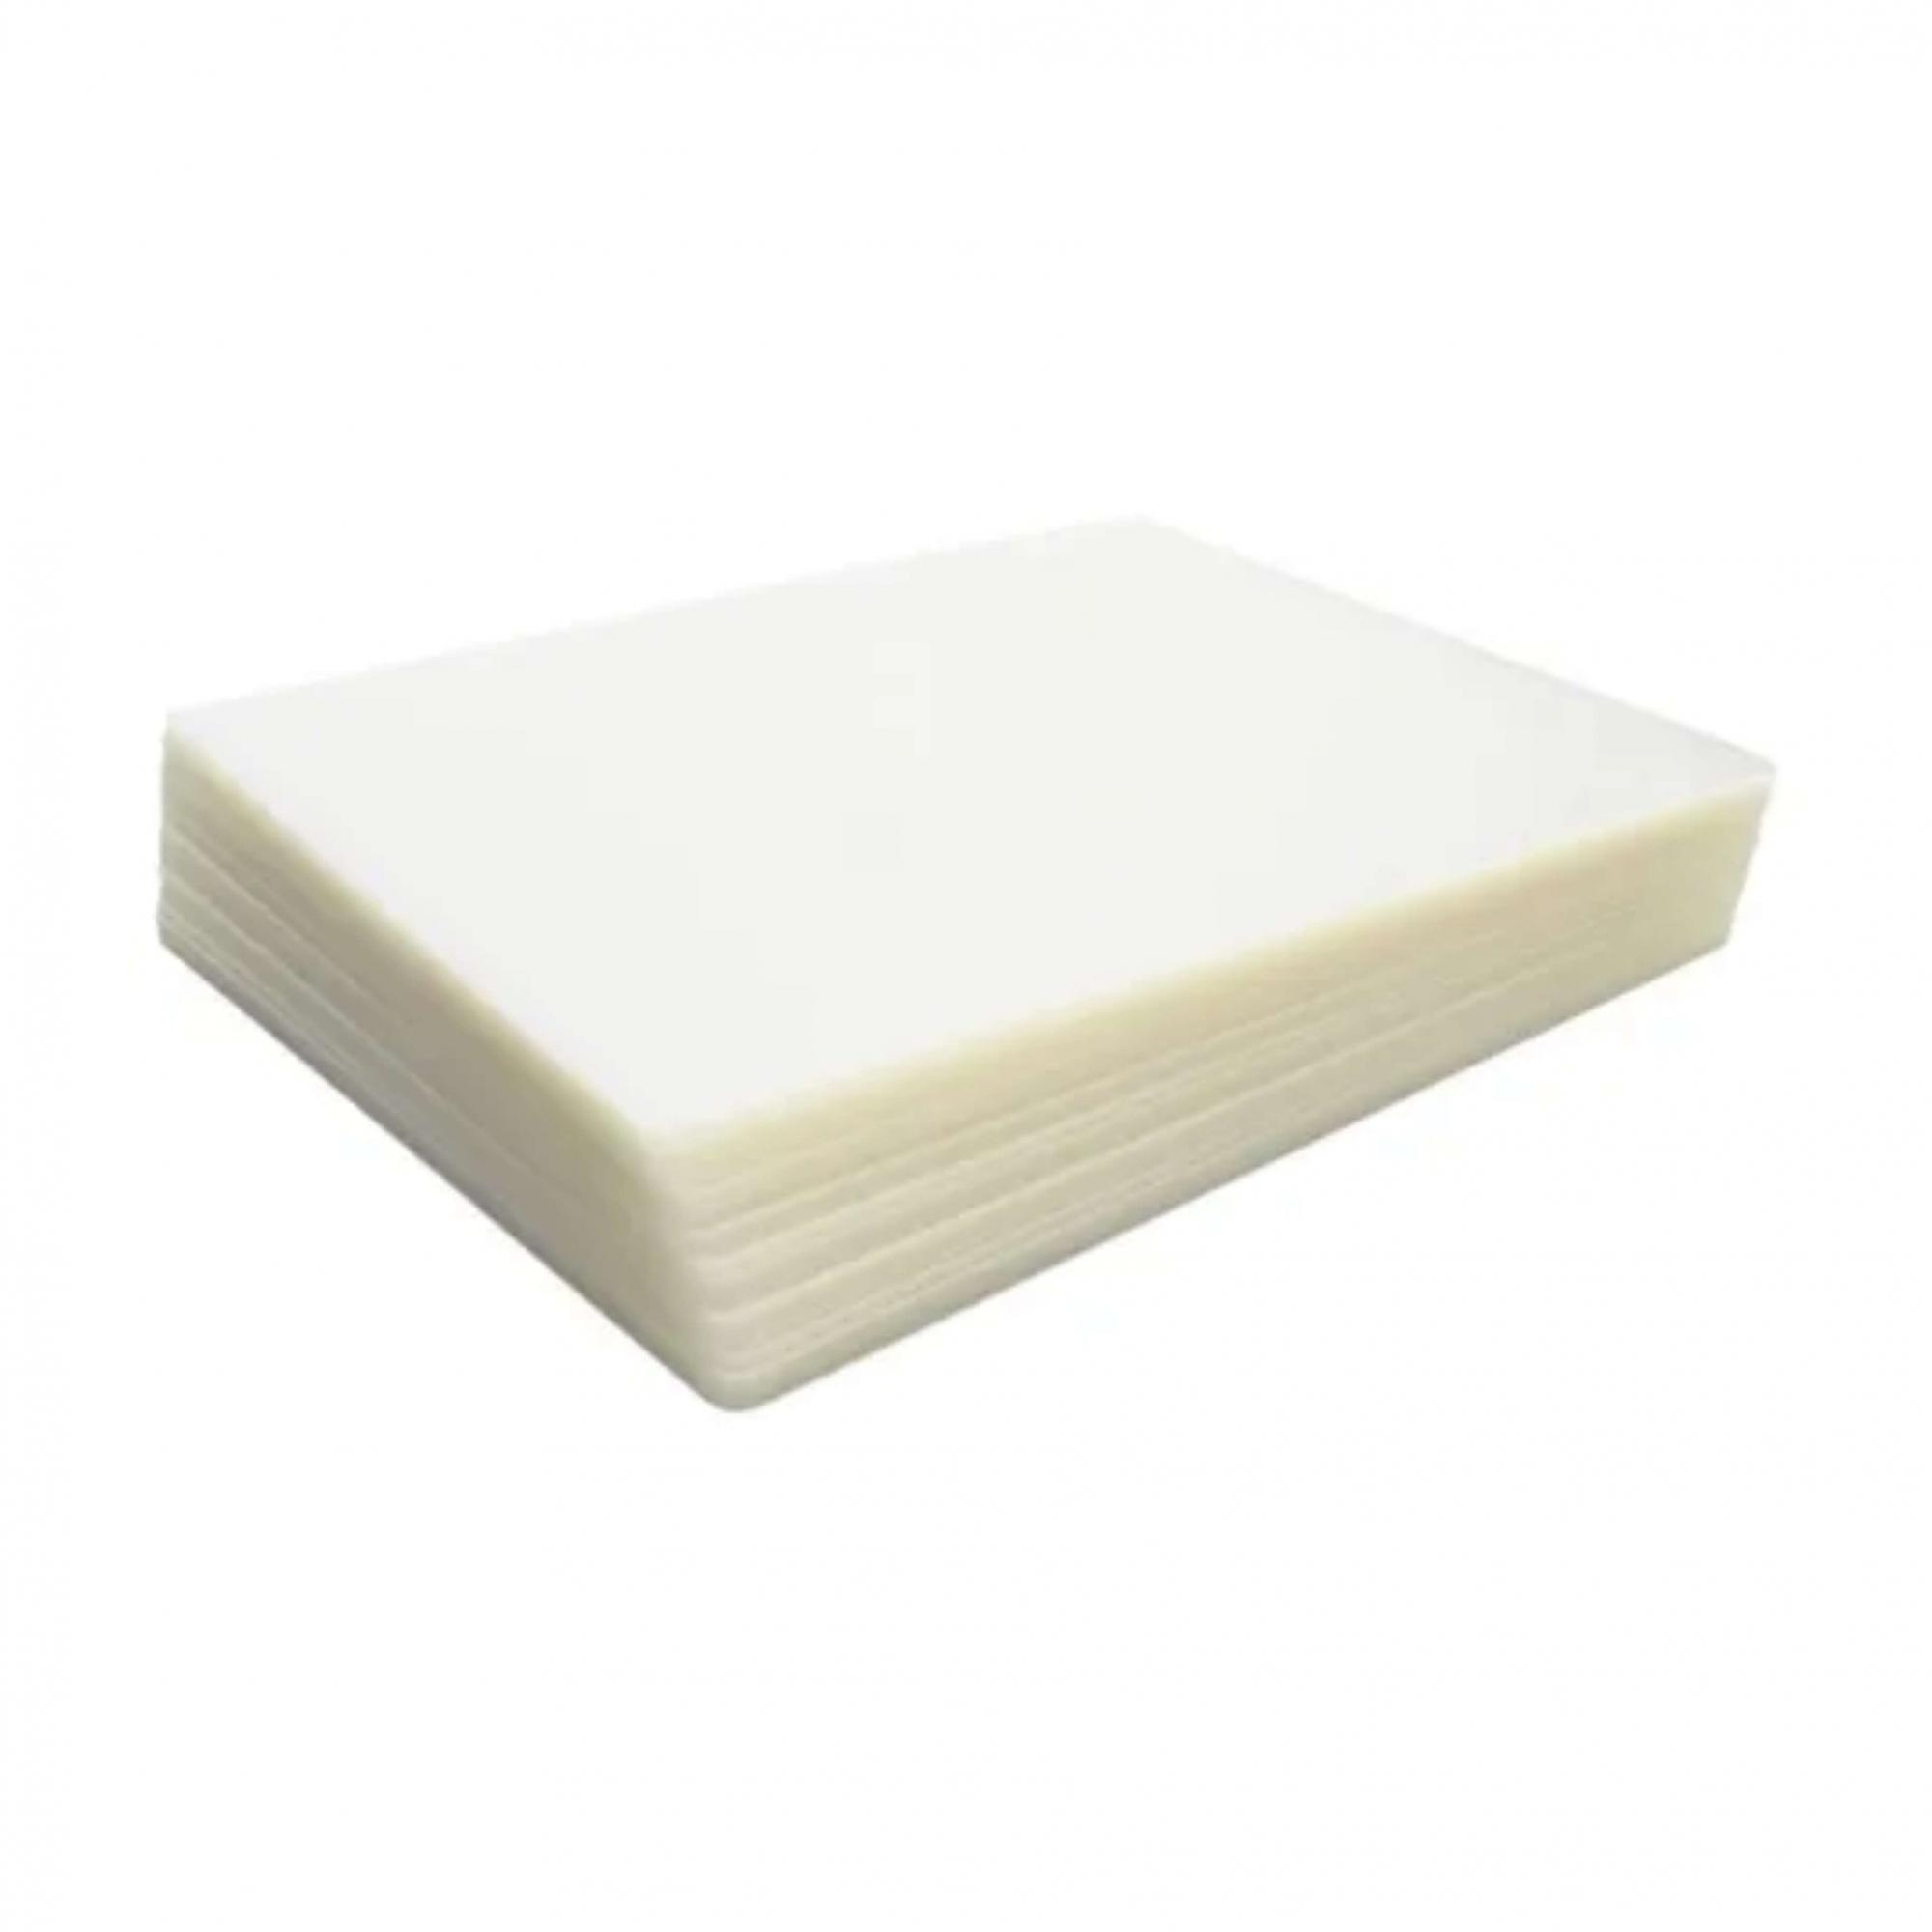 Polaseal Plástico para Plastificação Crachá 59x86x0,10 100un